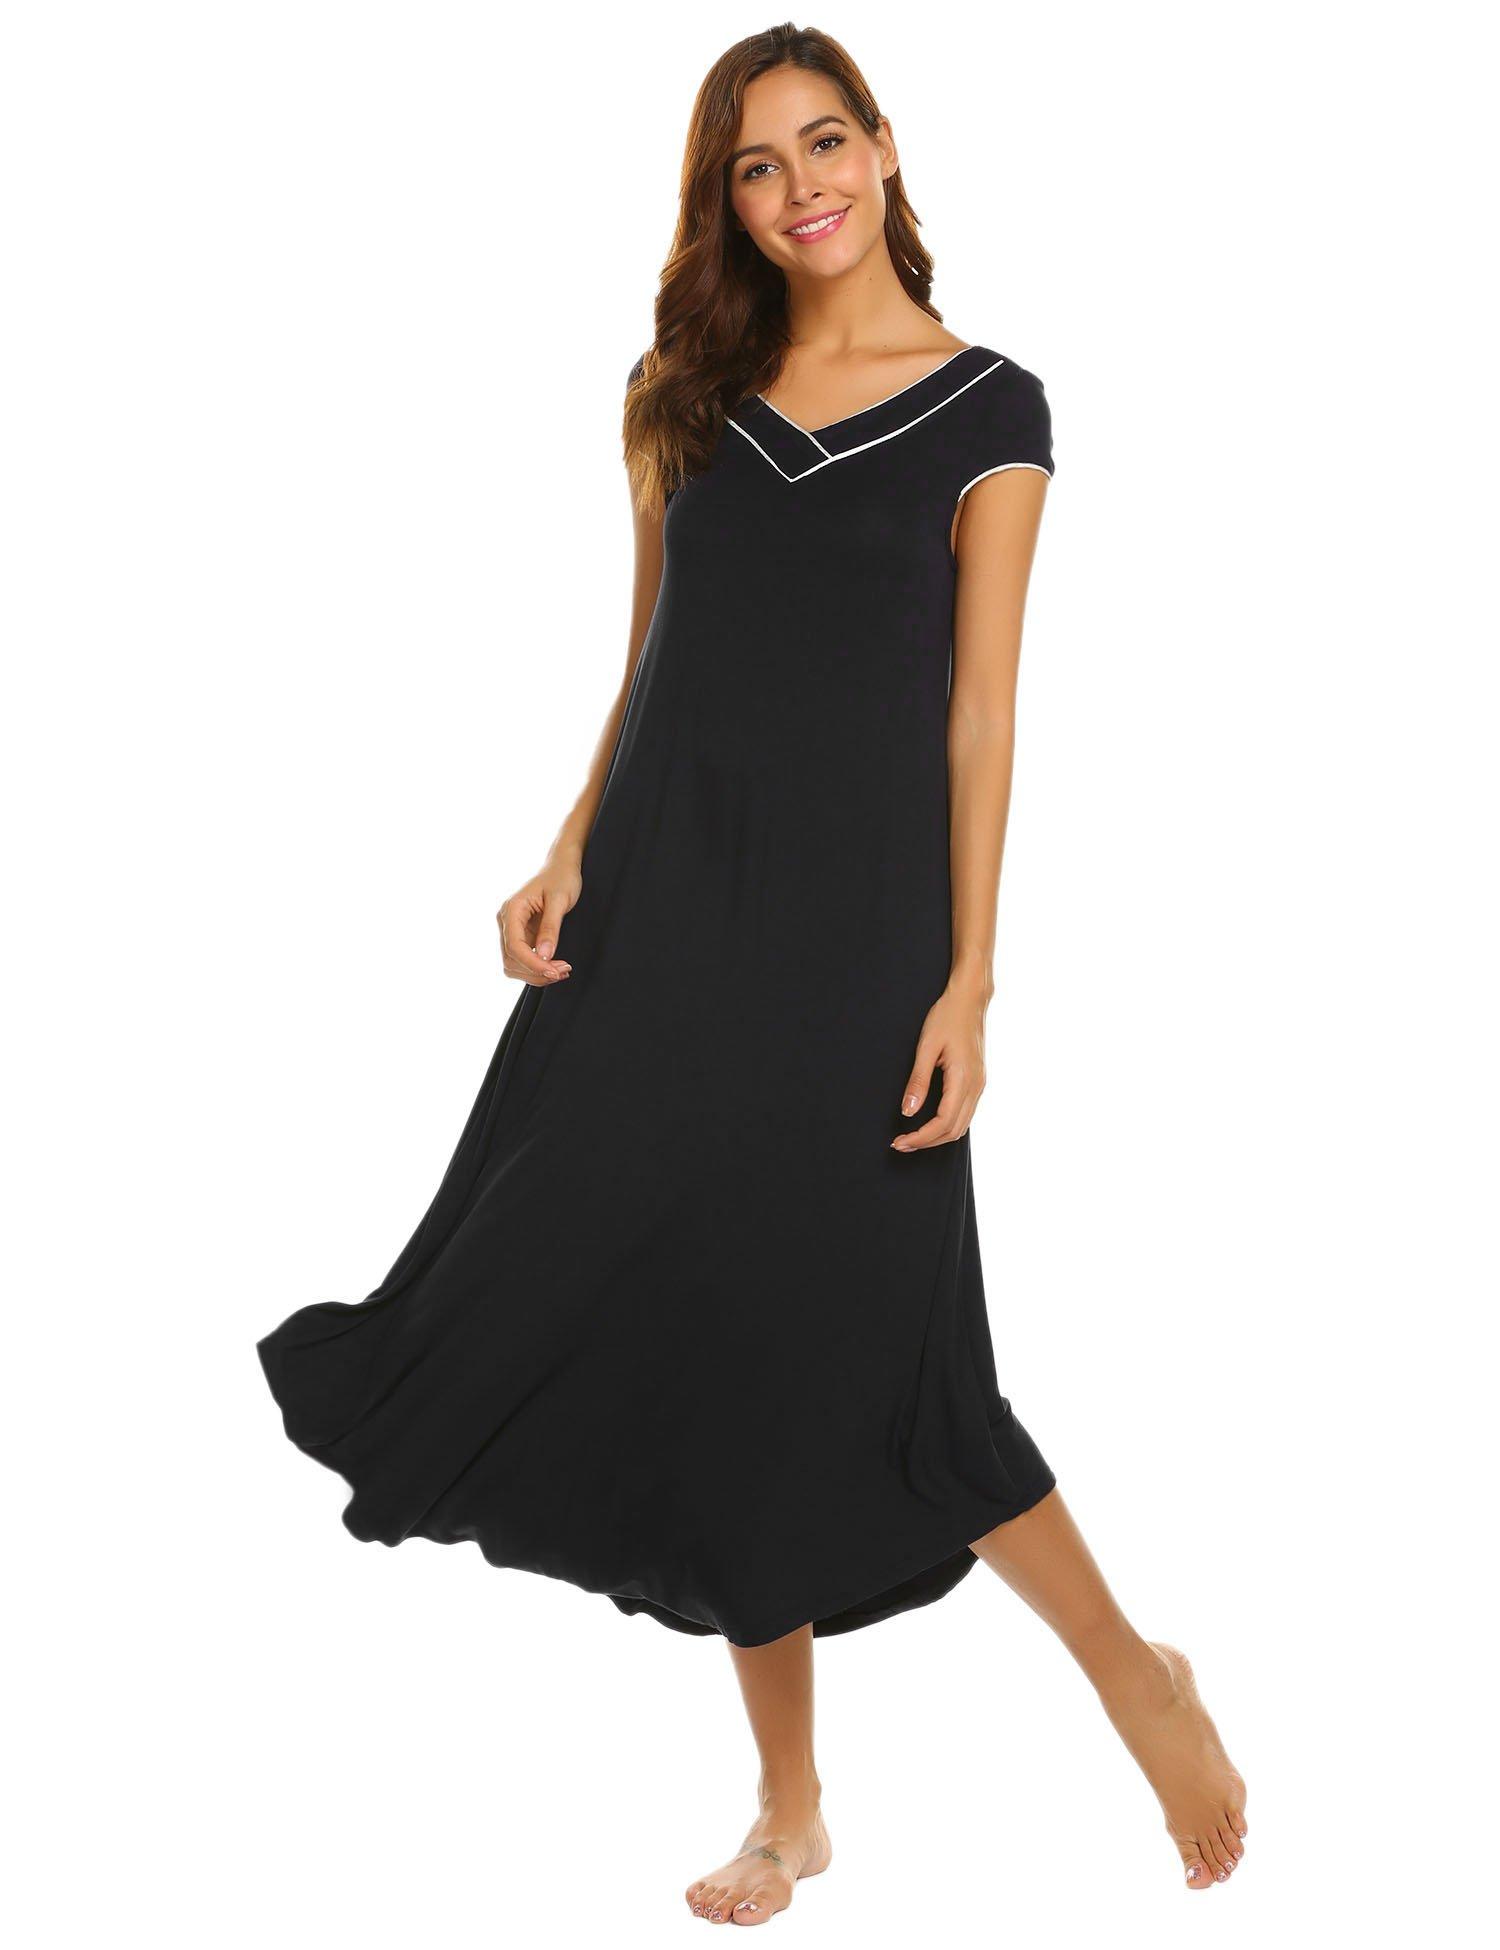 Ekouaer Womens Long Nightgown Short Sleeve Nightshirt Full Length Lounge Dress,Black,XX-Large